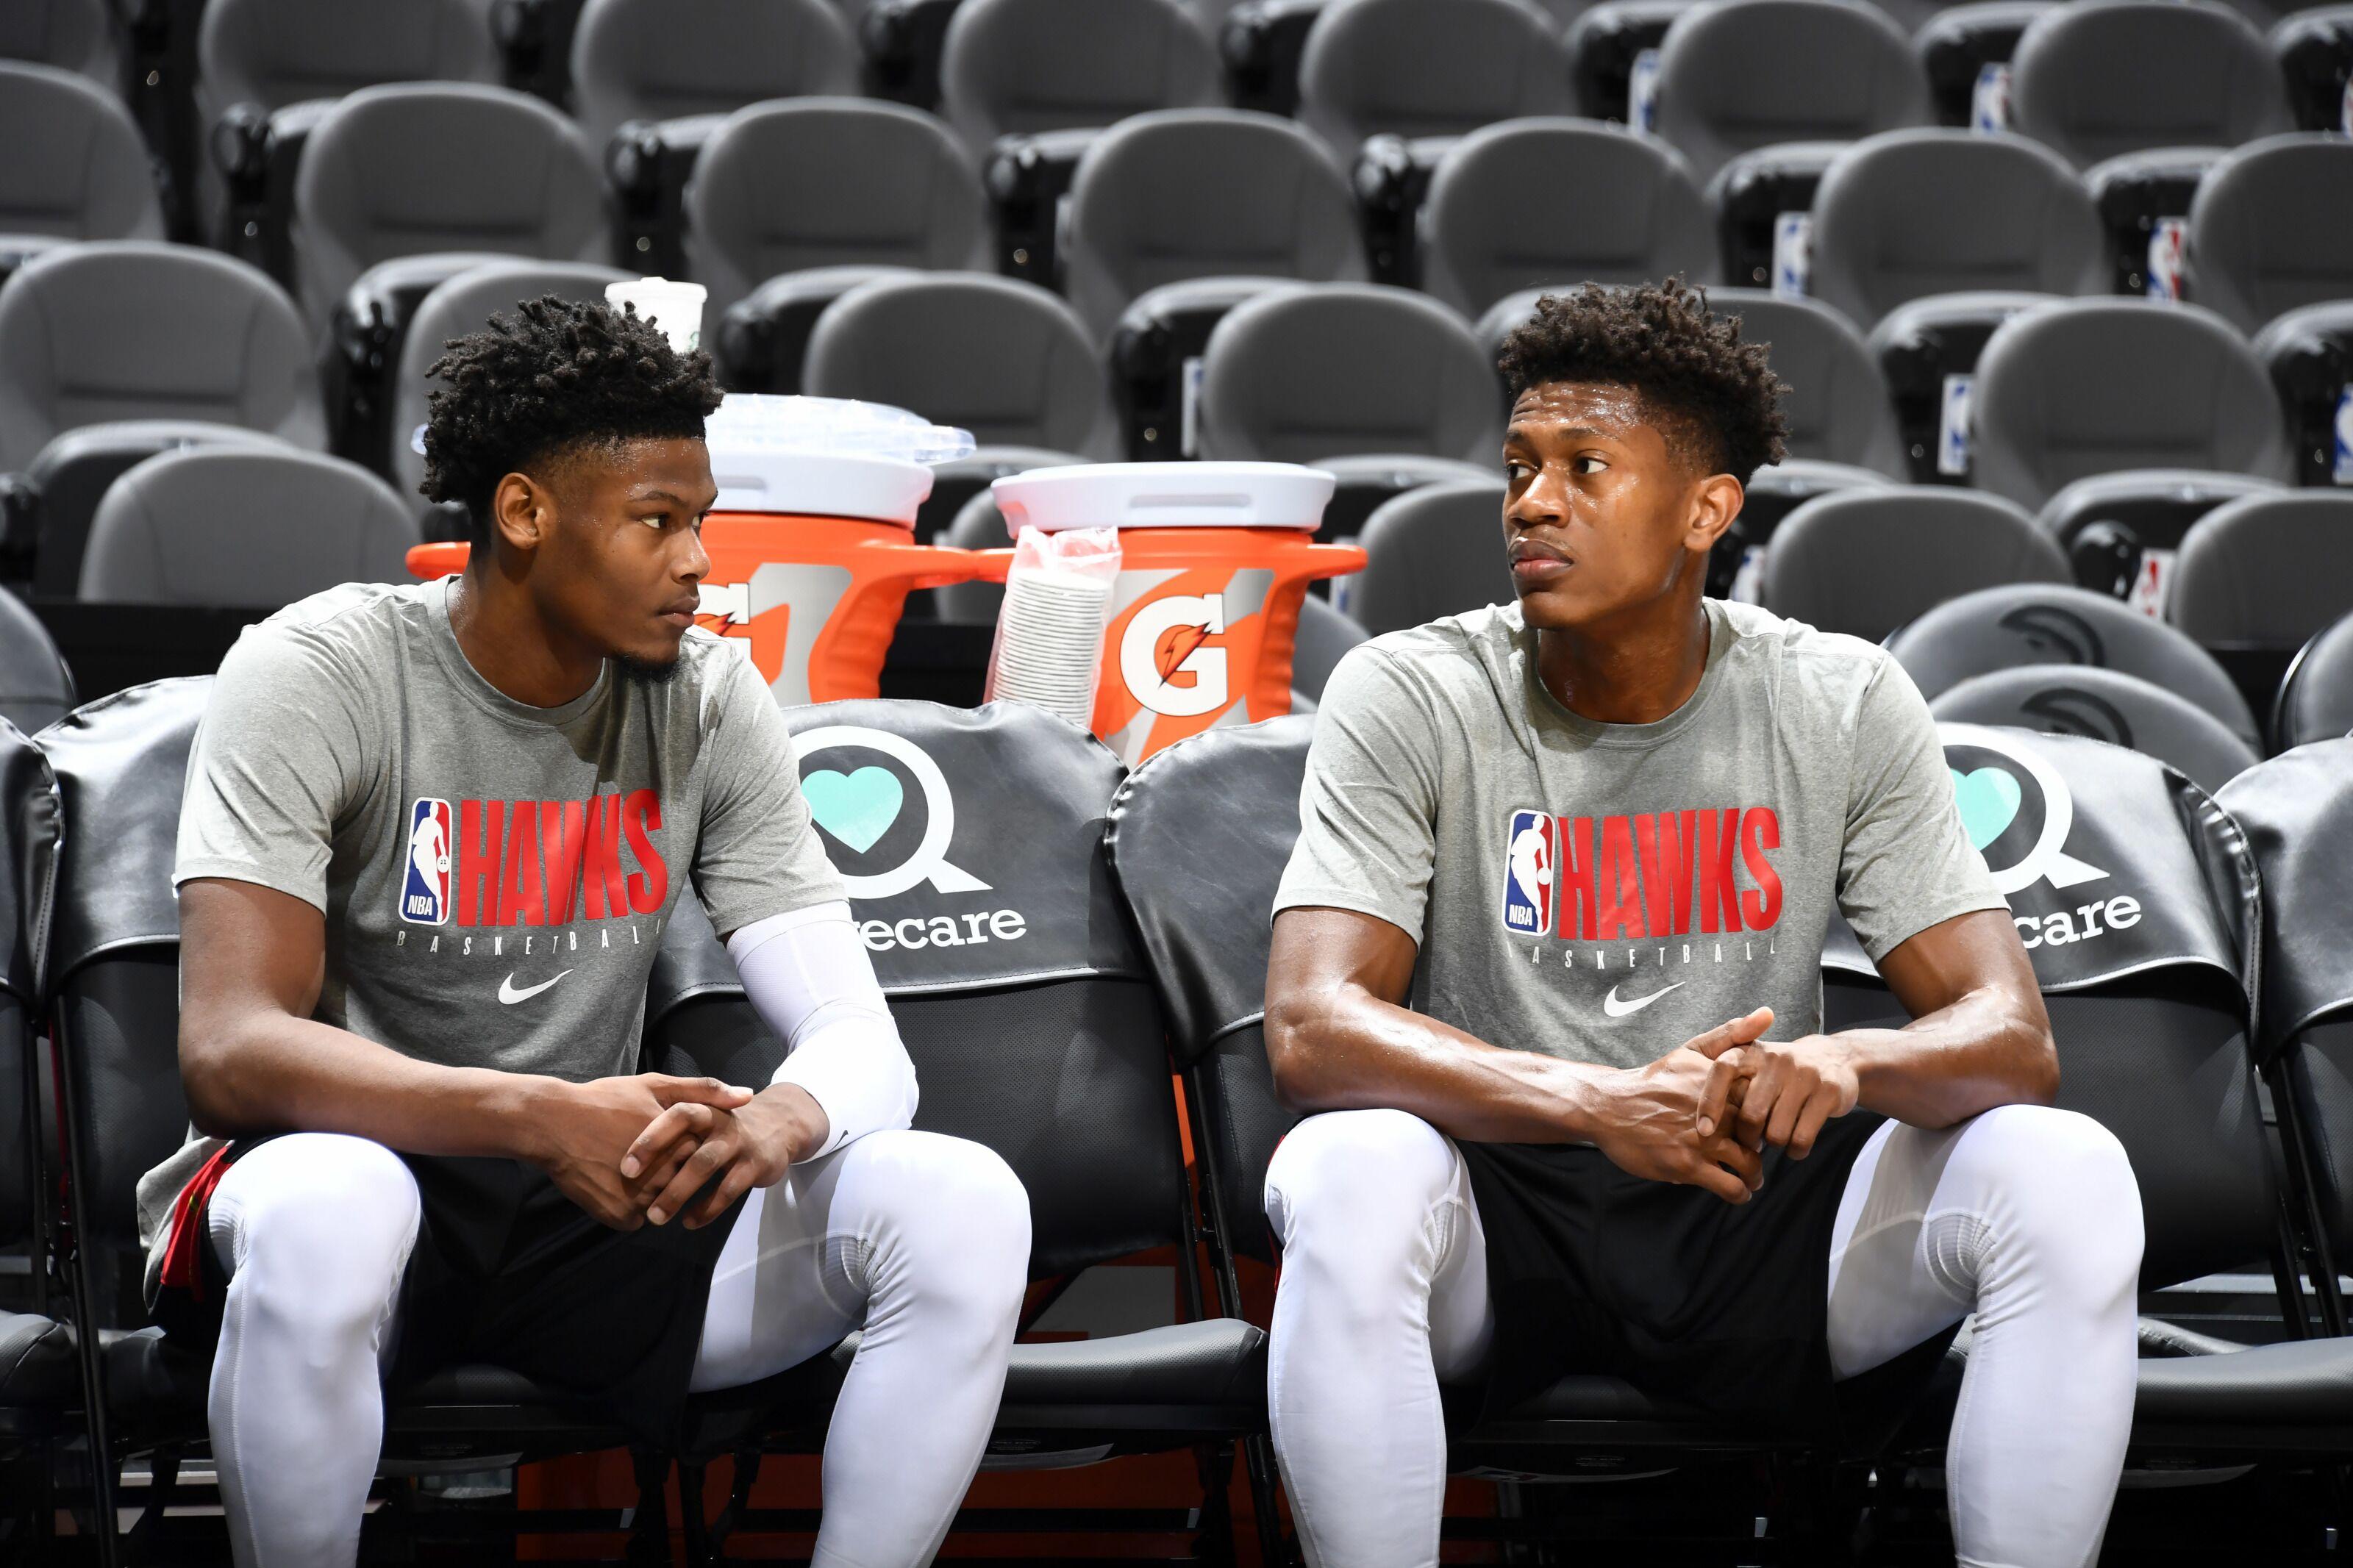 Atlanta Hawks' Tale of Two Rookies